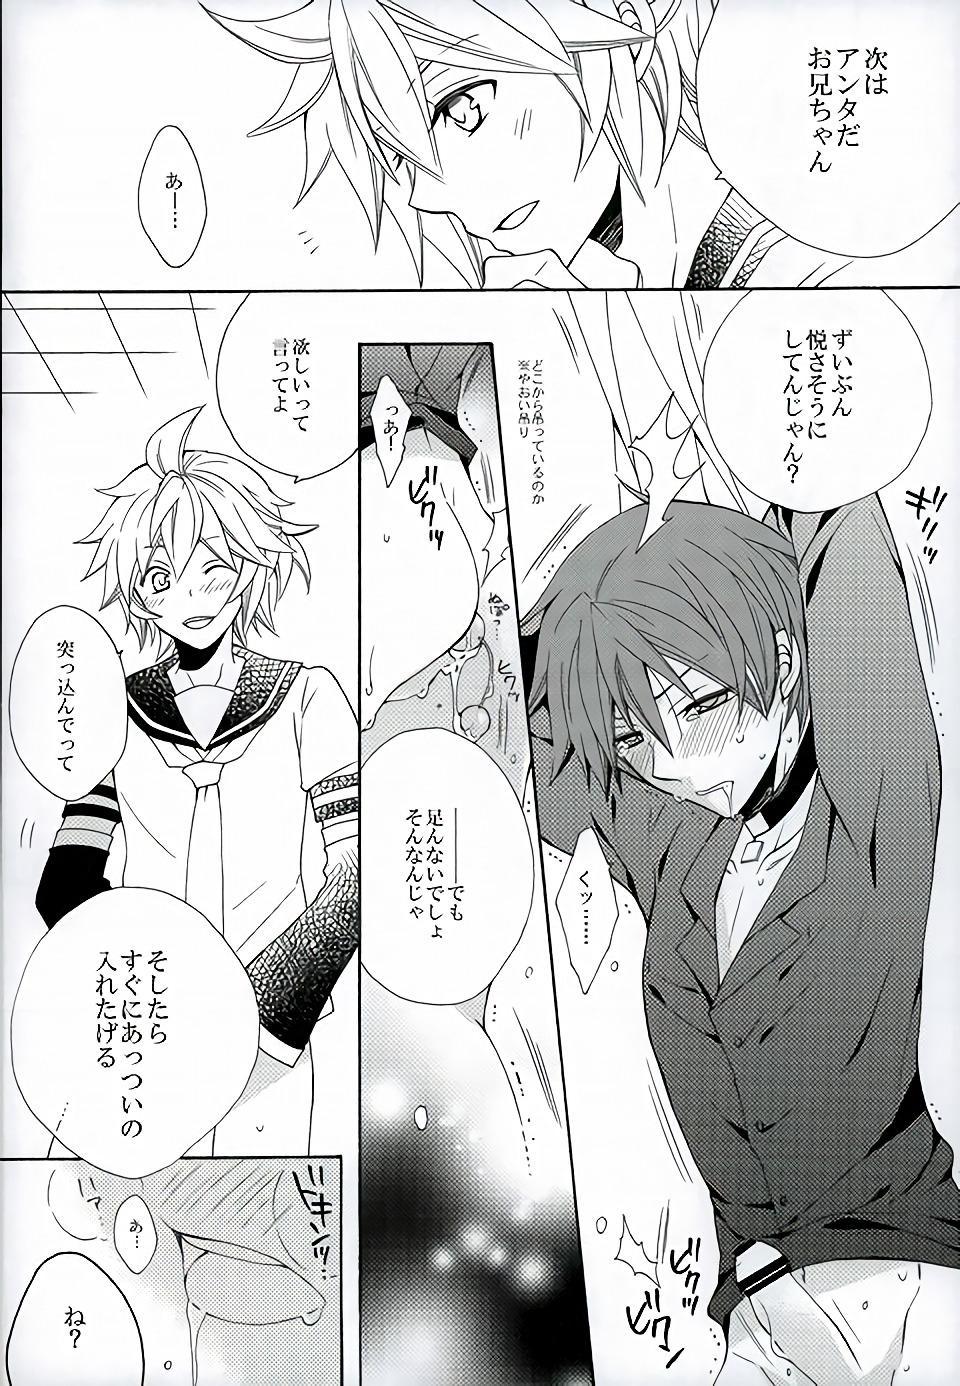 Hatsudori Document 4